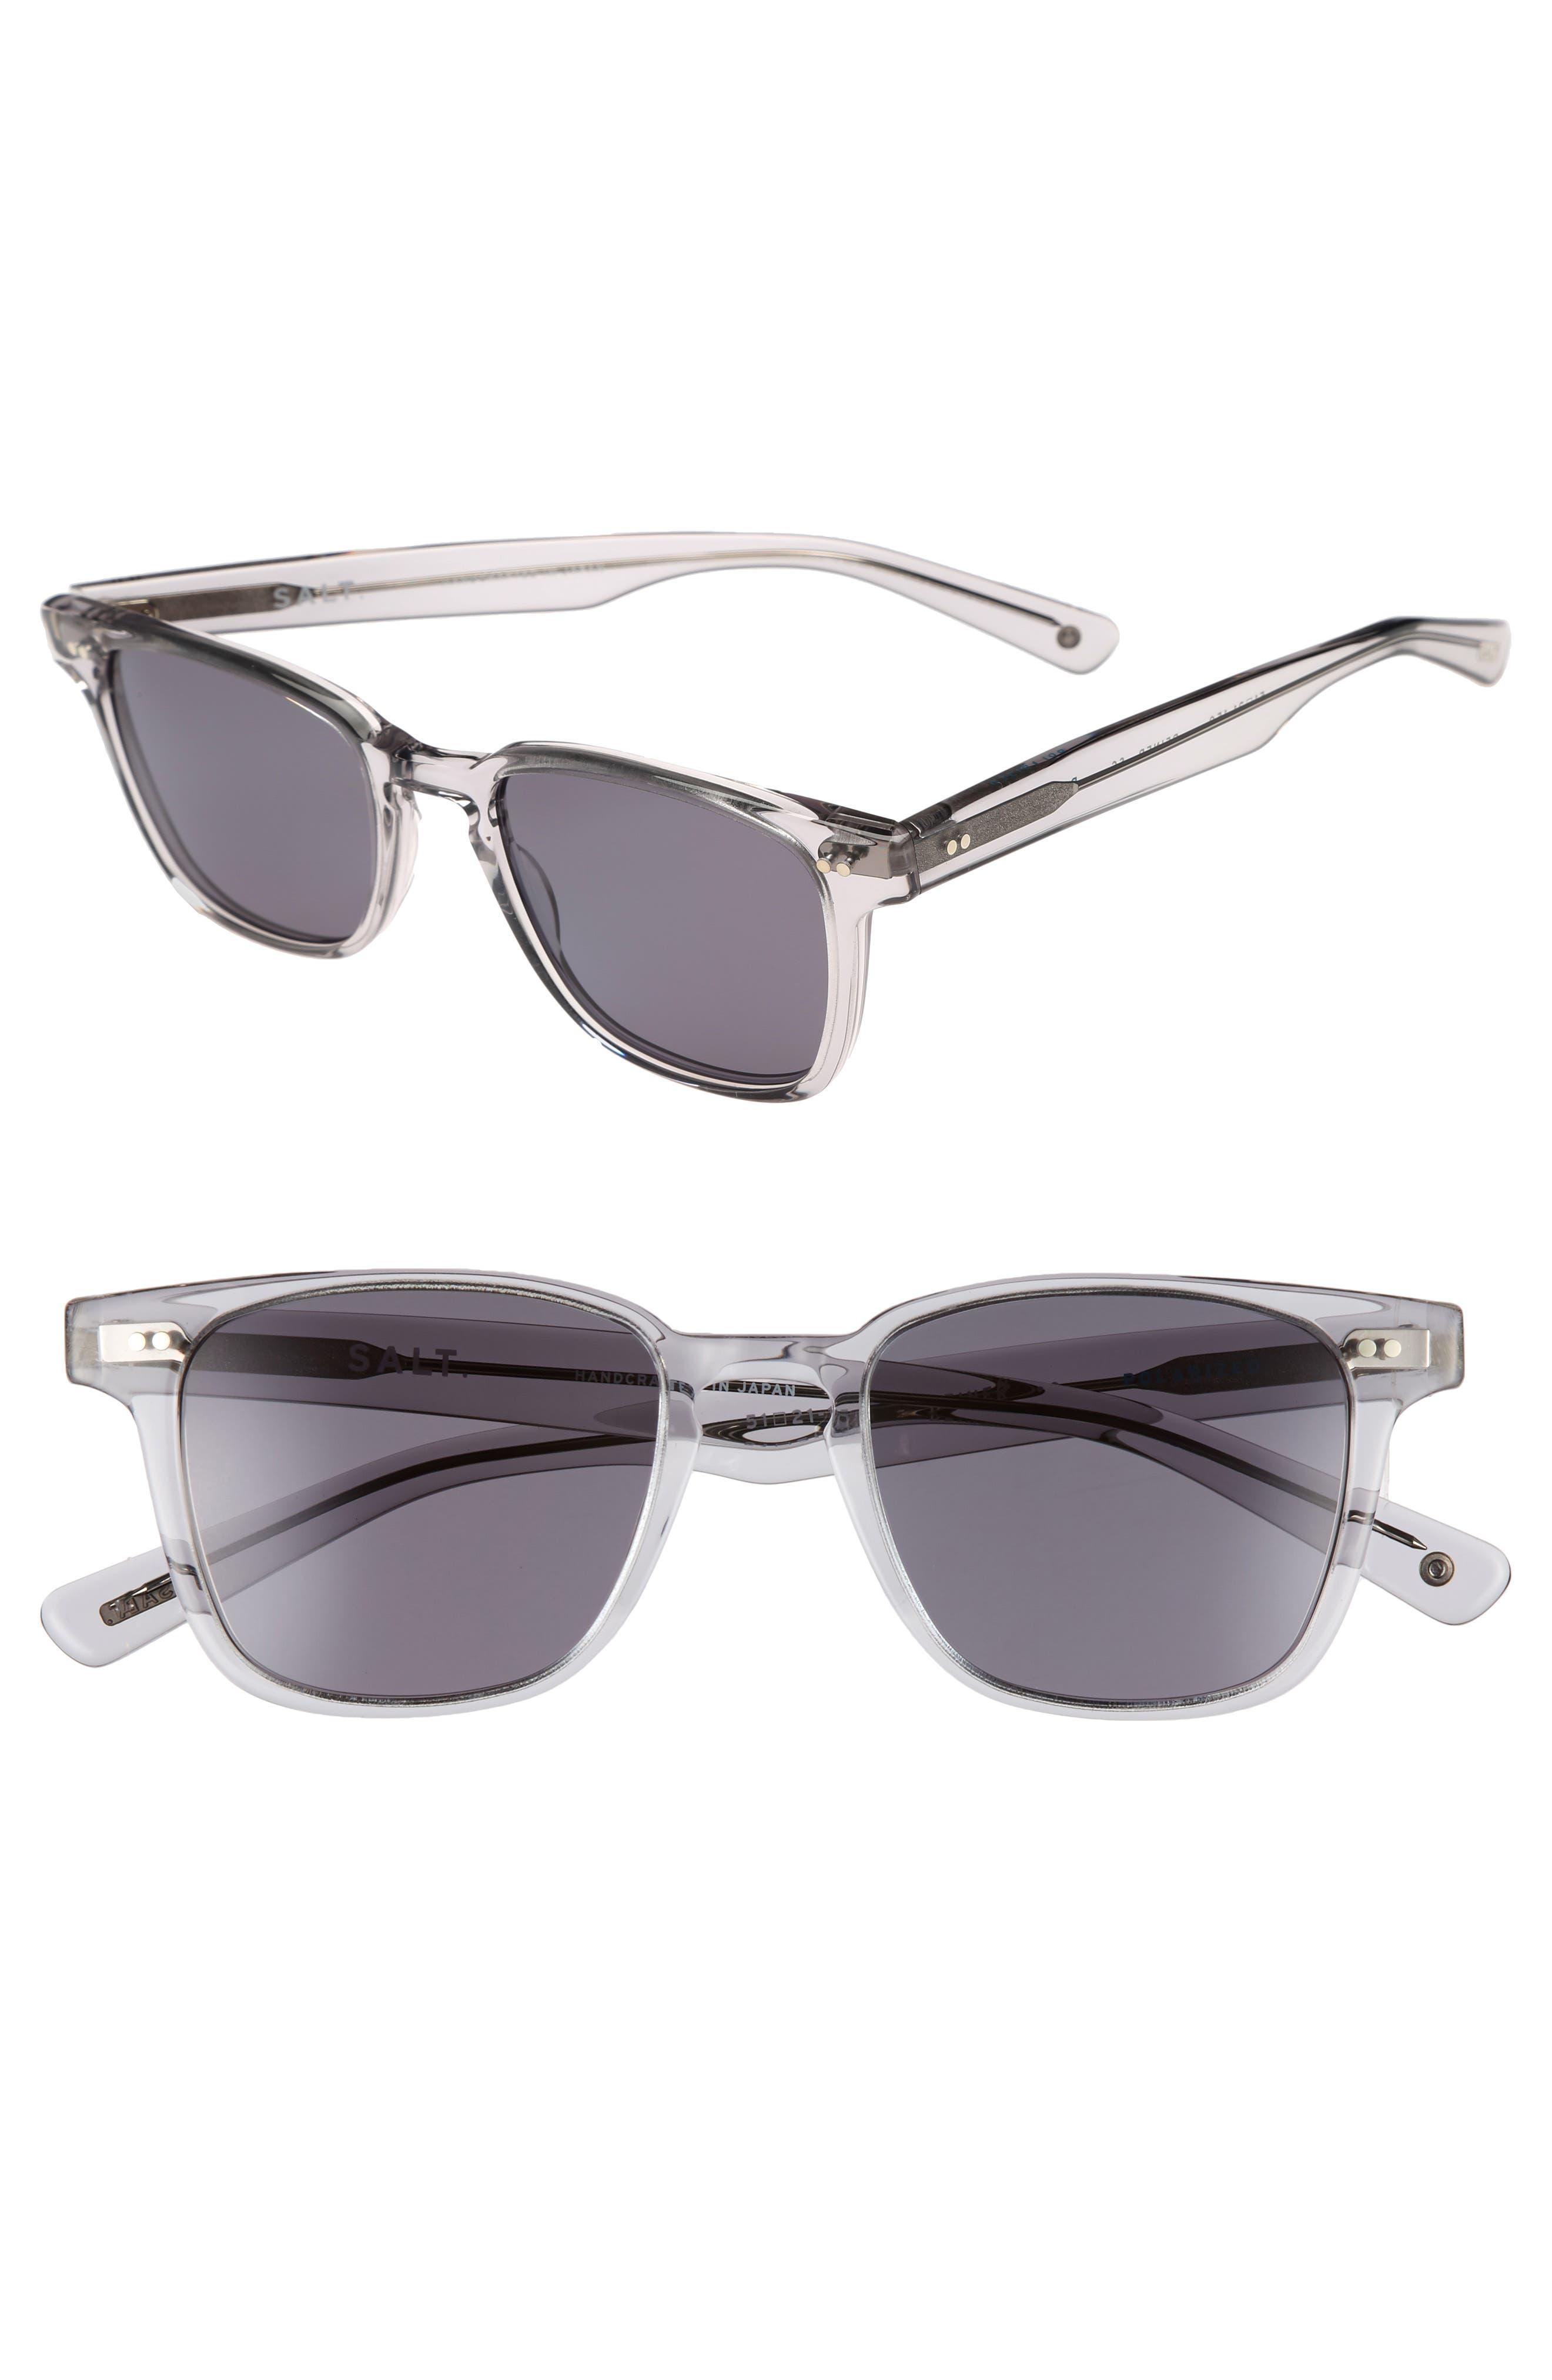 Main Image - SALT Reiner 51mm Polarized Sunglasses